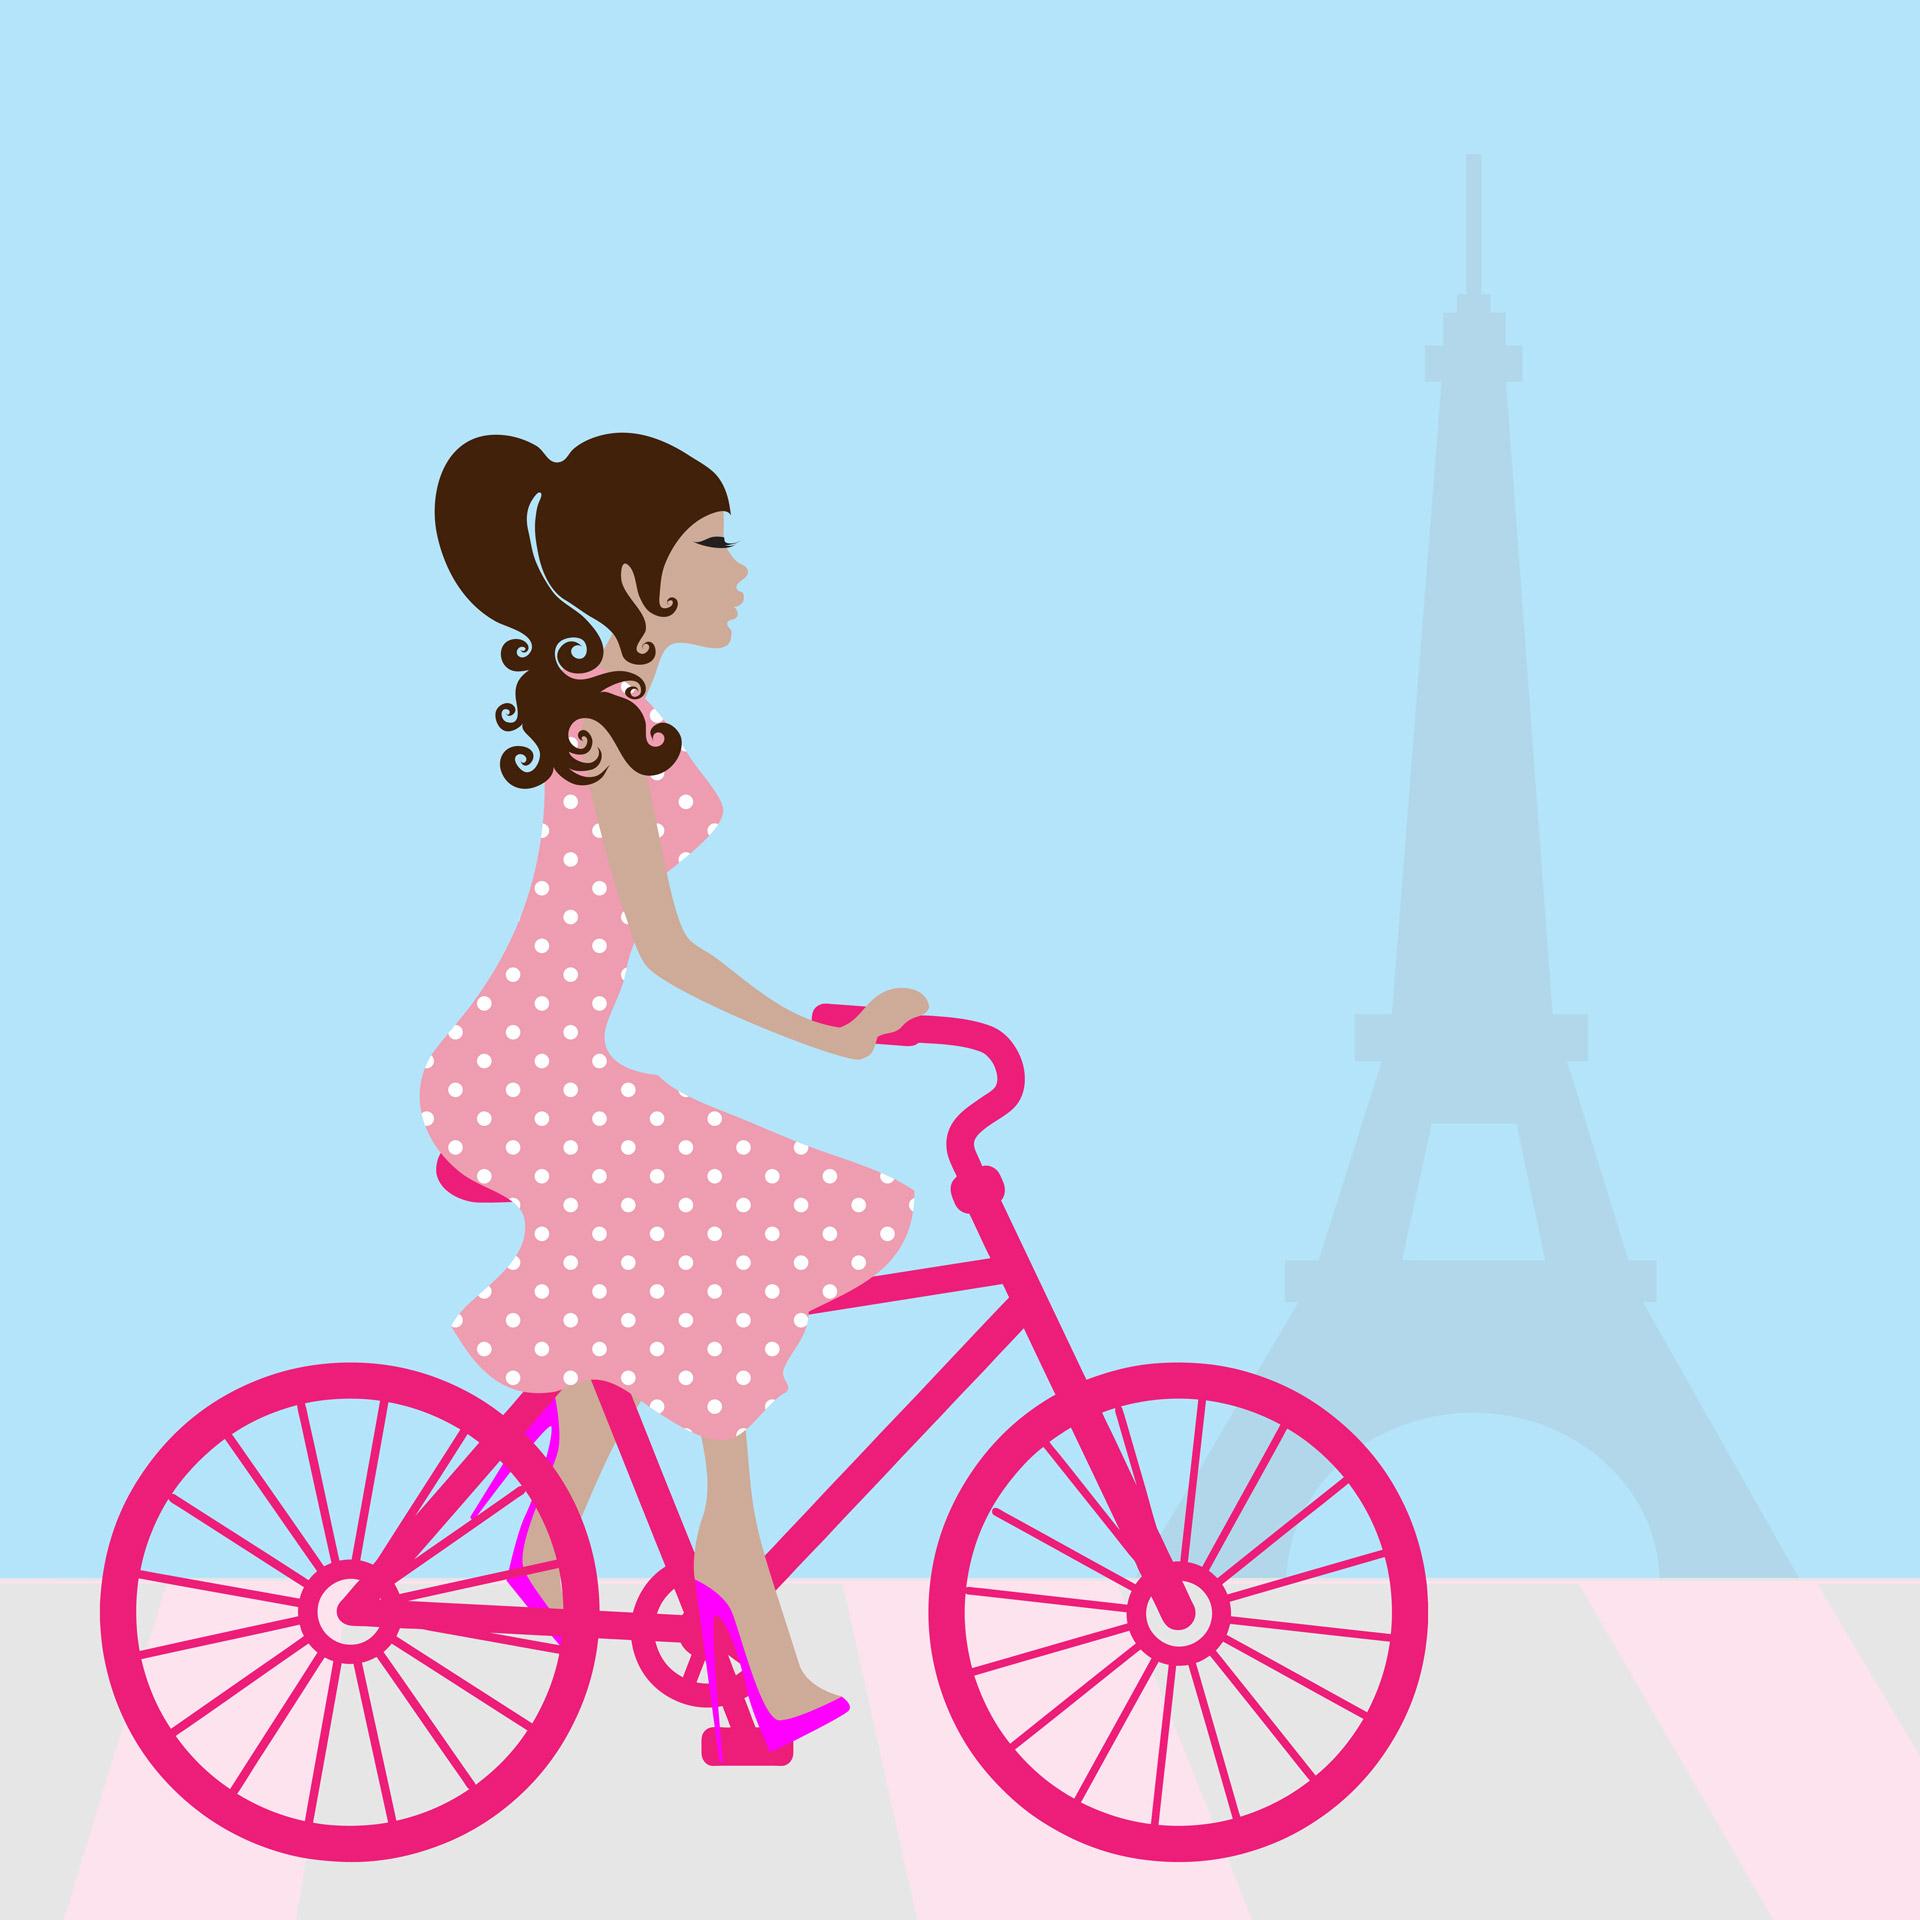 1920x1920 Girl Cycling In Paris Free Stock Photo